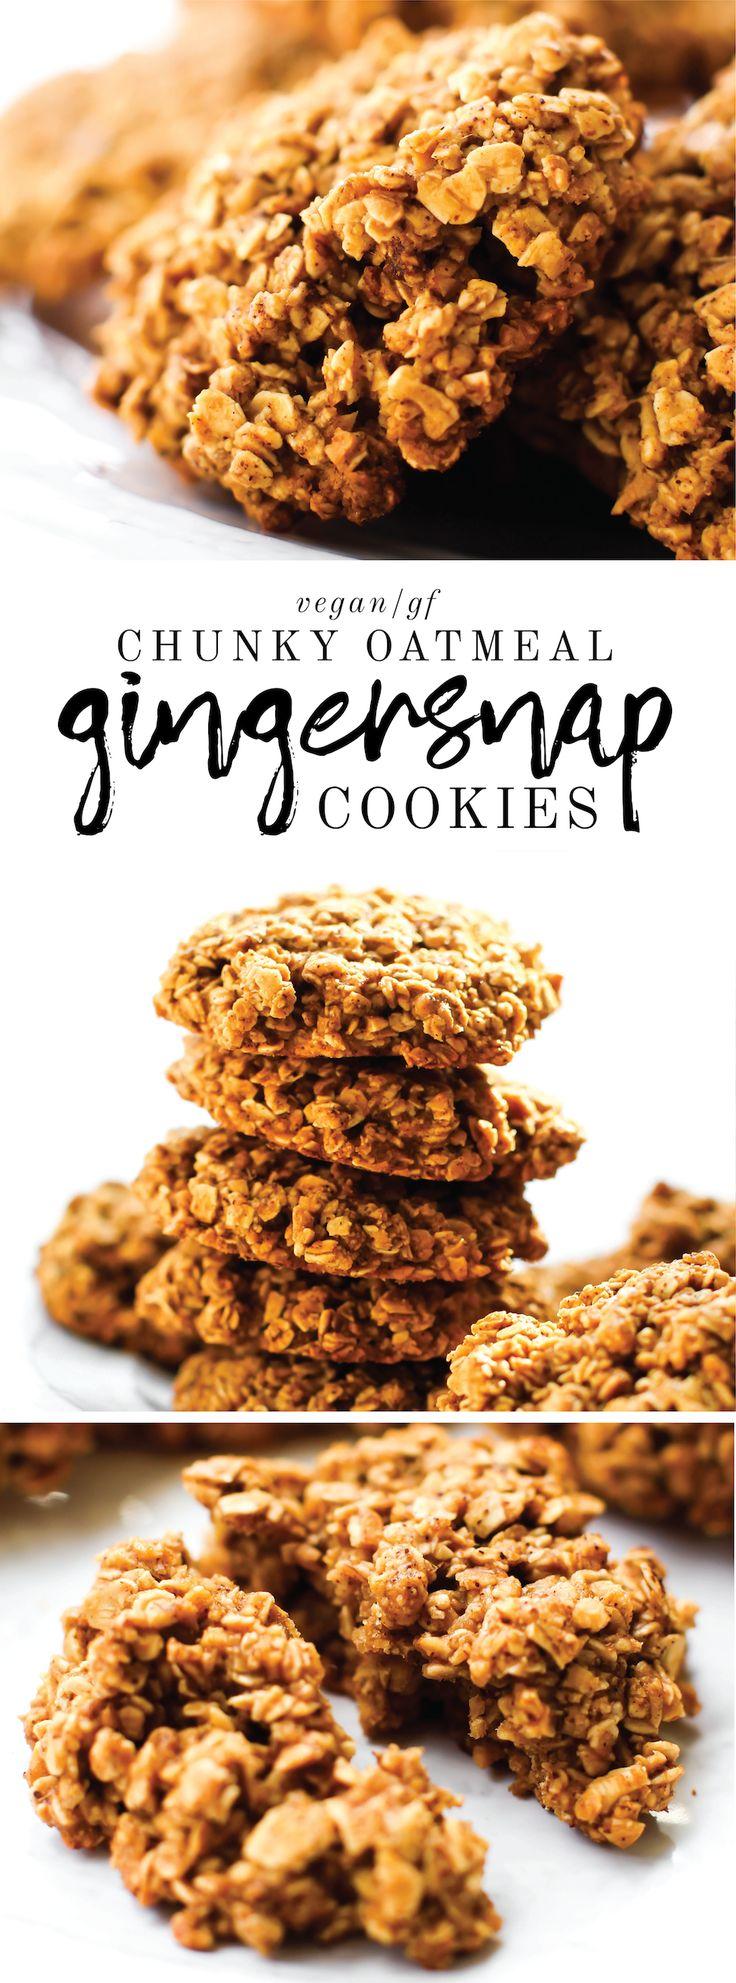 Chunky Vegan Oatmeal Gingersnap Cookies {gluten-free & oil-free} //PINTEREST: selinaa//